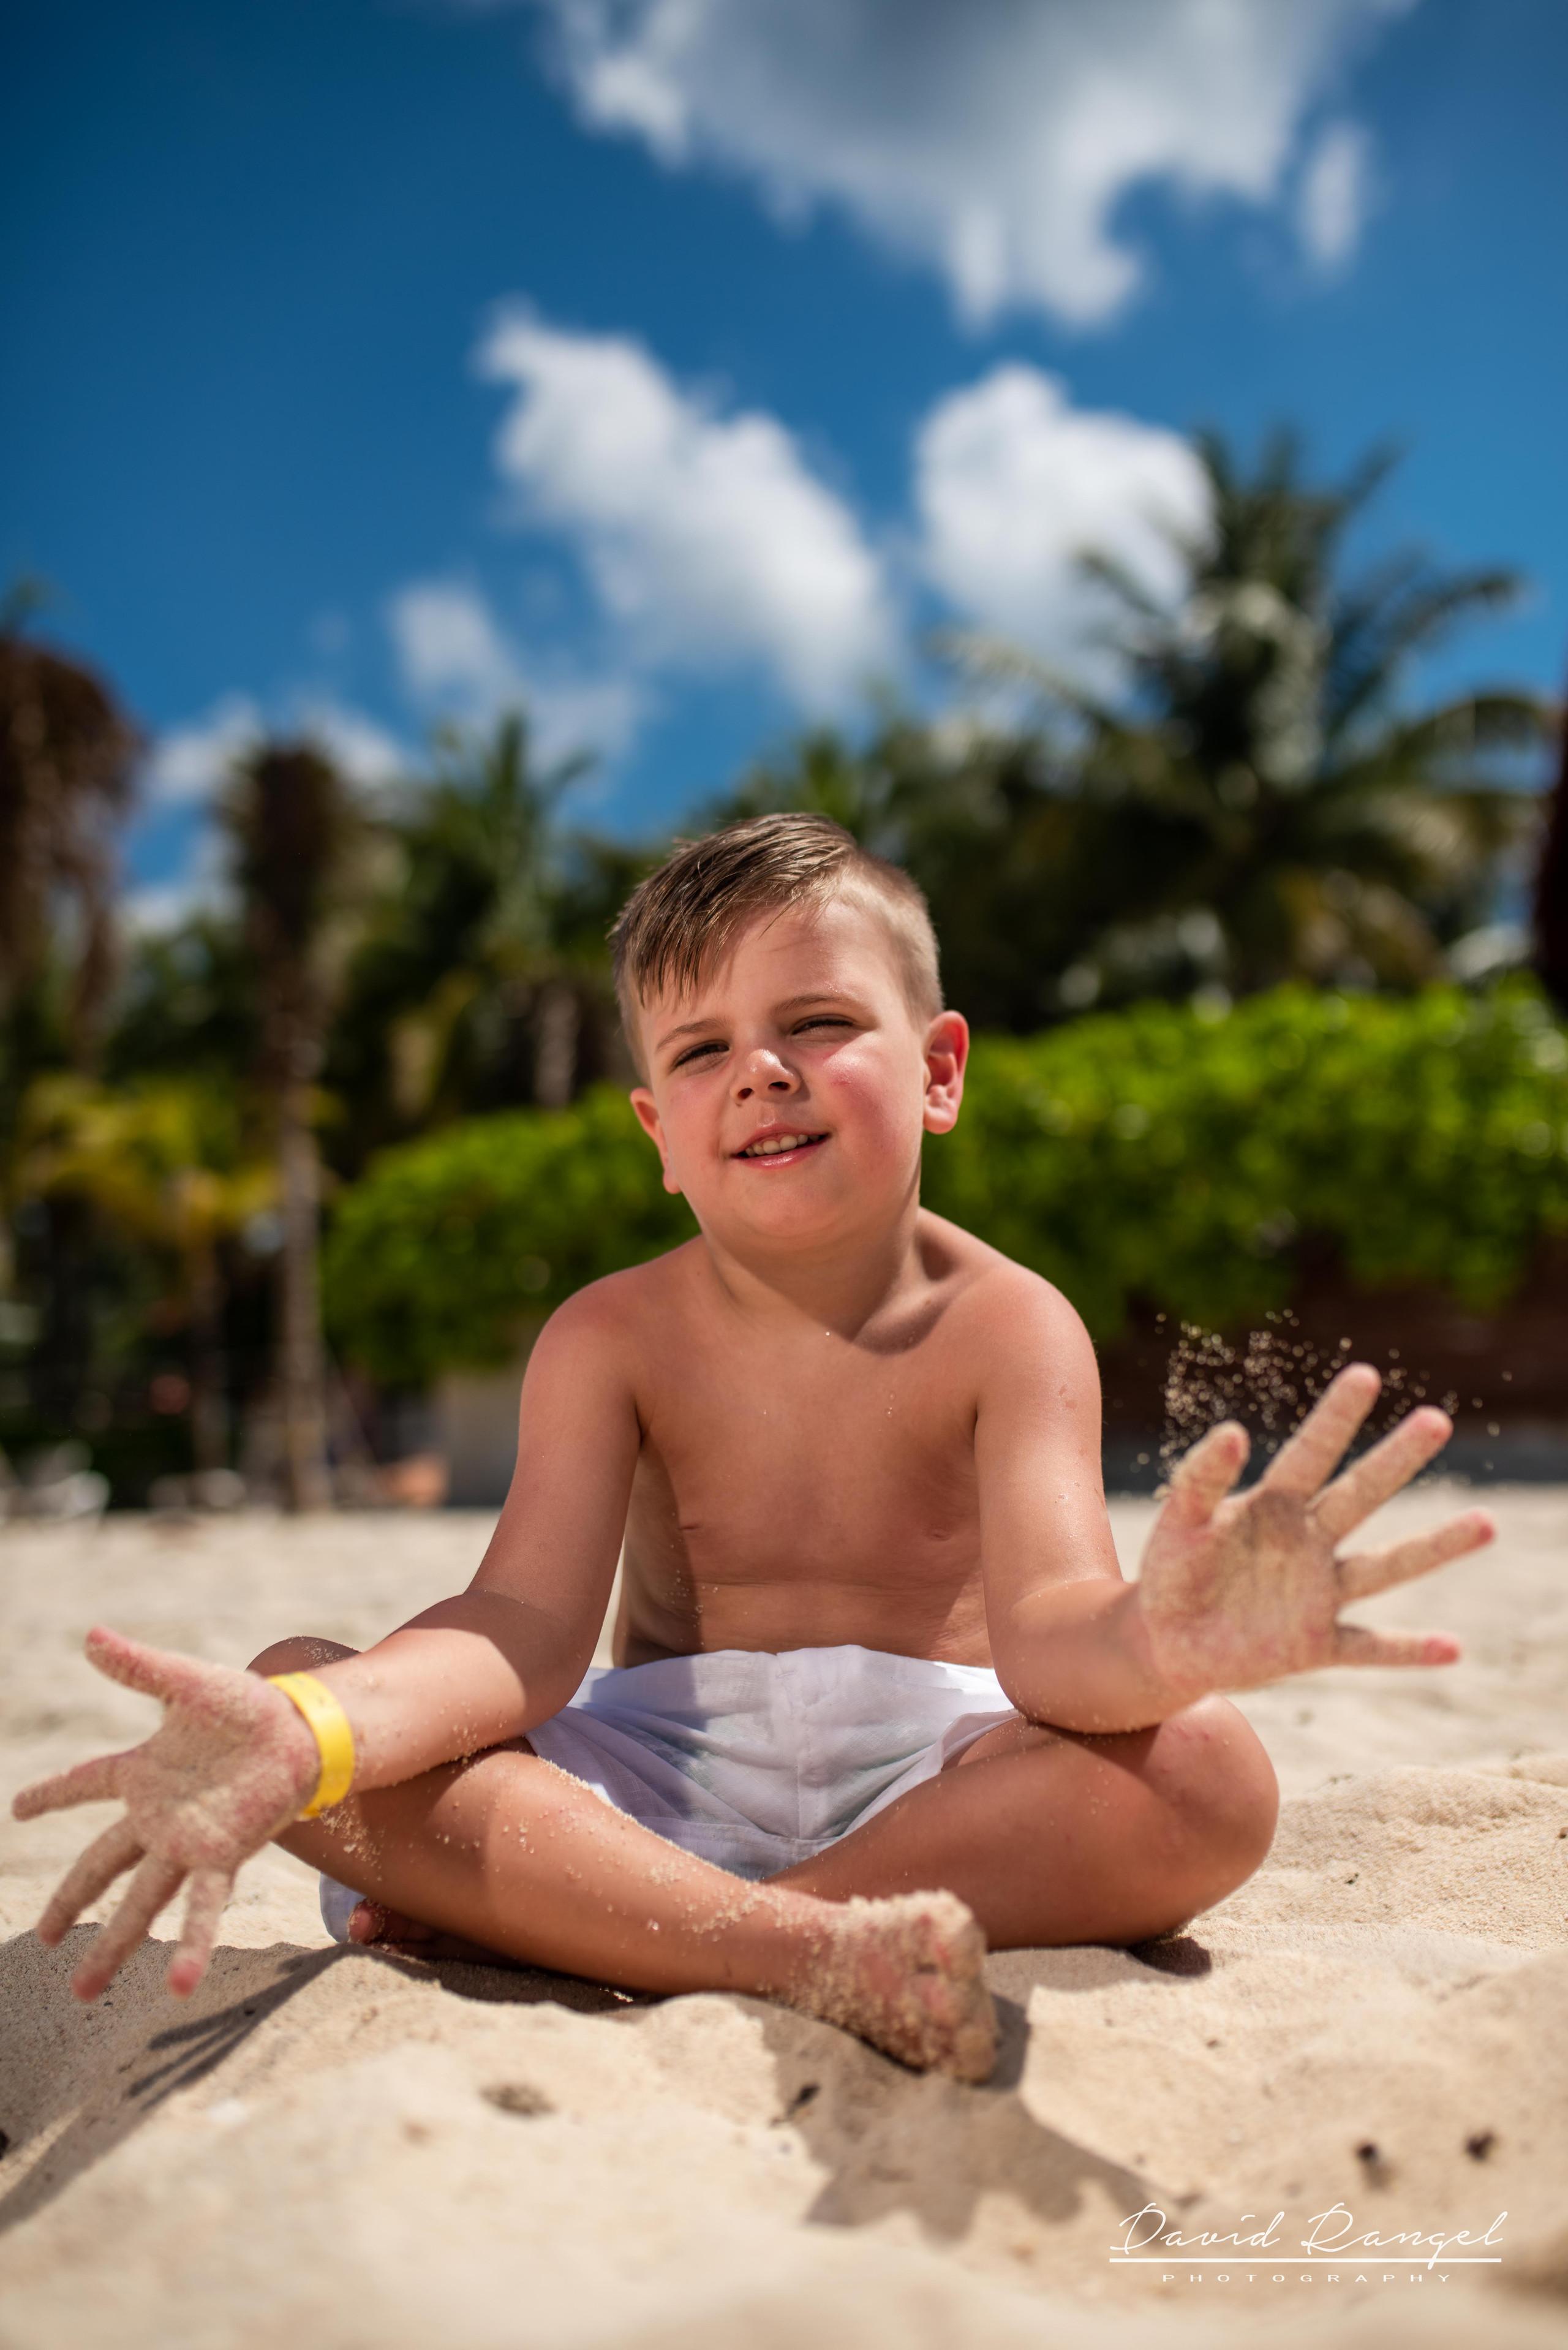 kid+boy+session+beach+cozumel+island+photo+destination+photographer+play+water+pier+paradise+happy